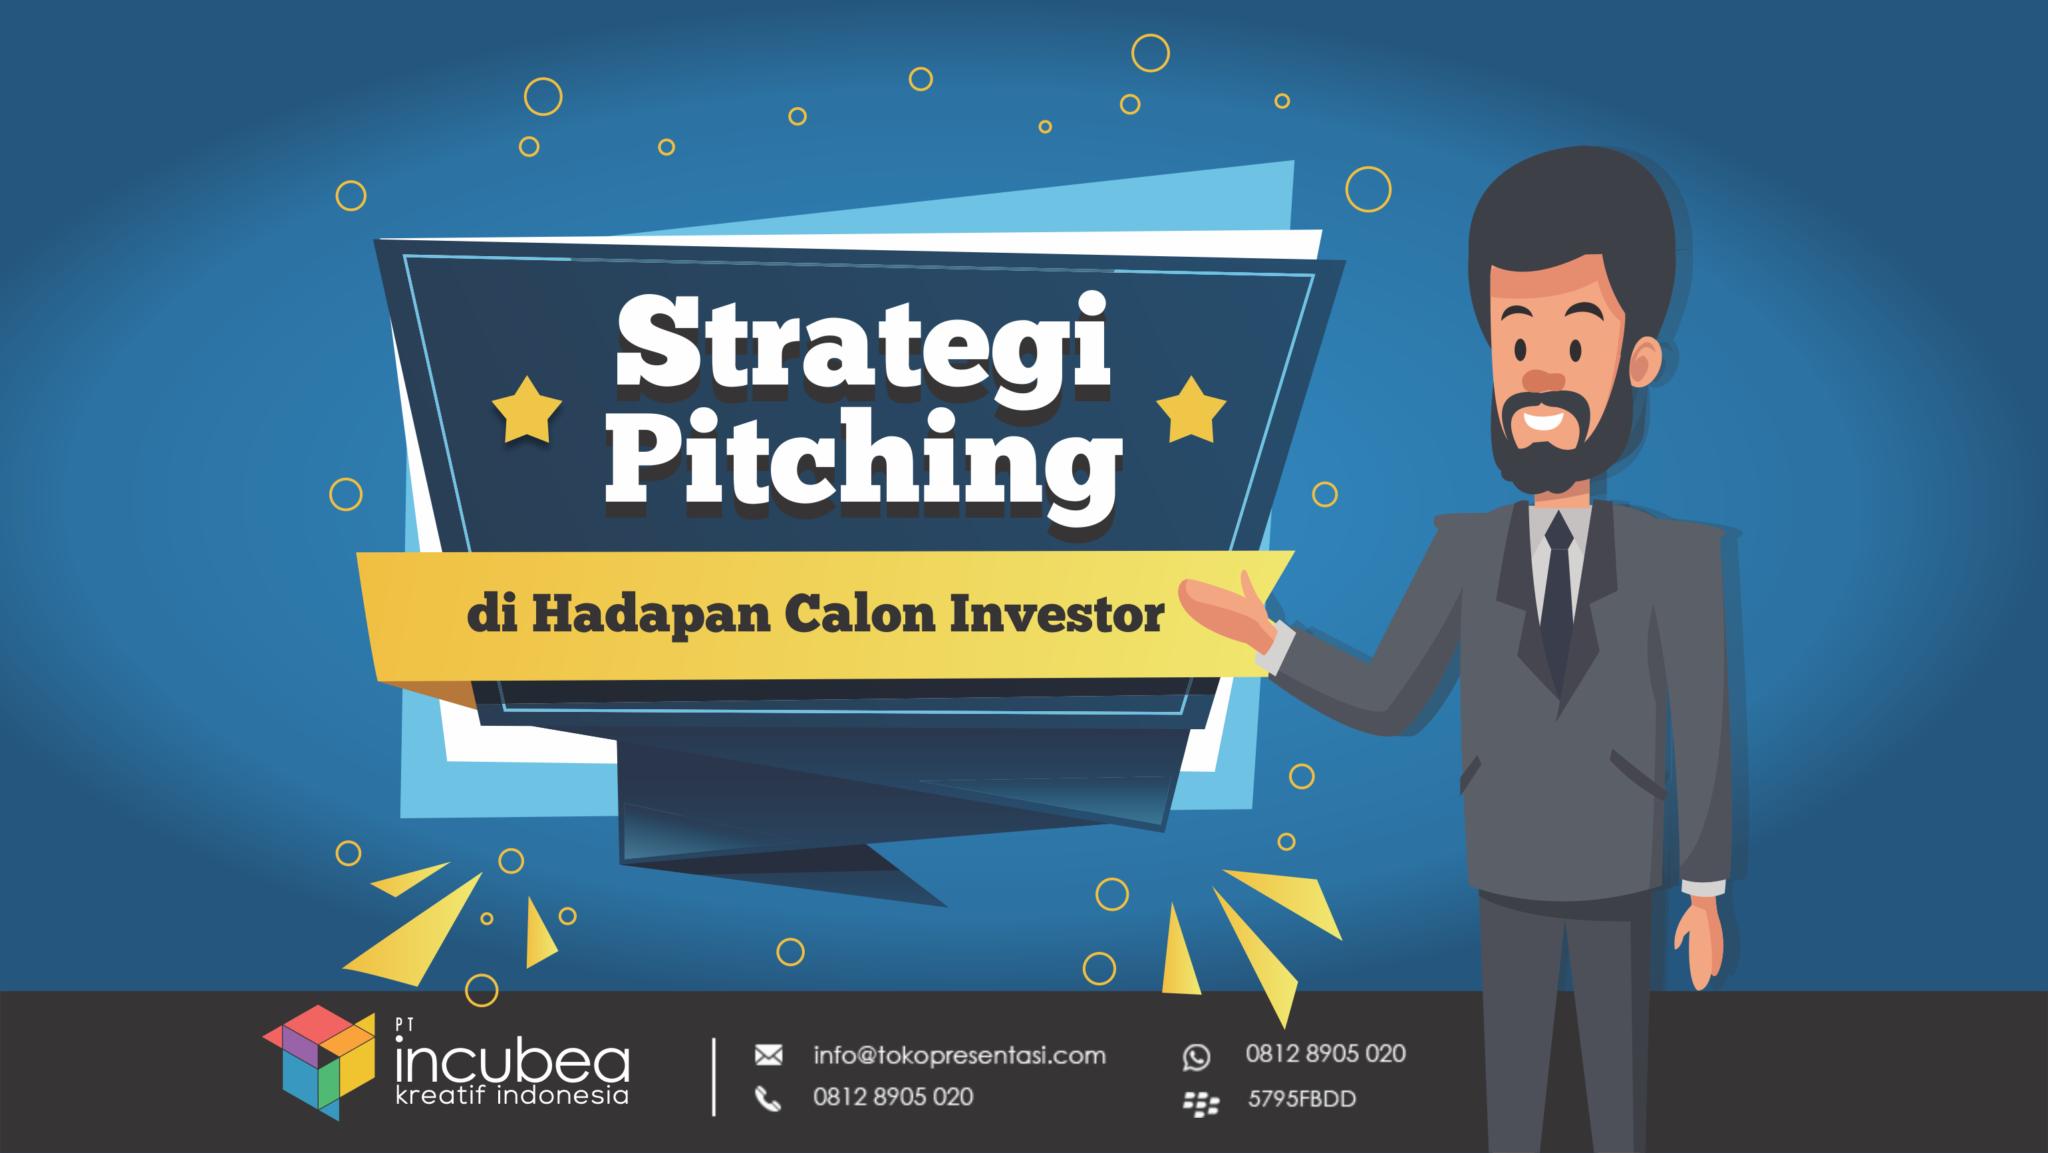 tips presentasi pitching di hadapan calon investor - tokopresentasi